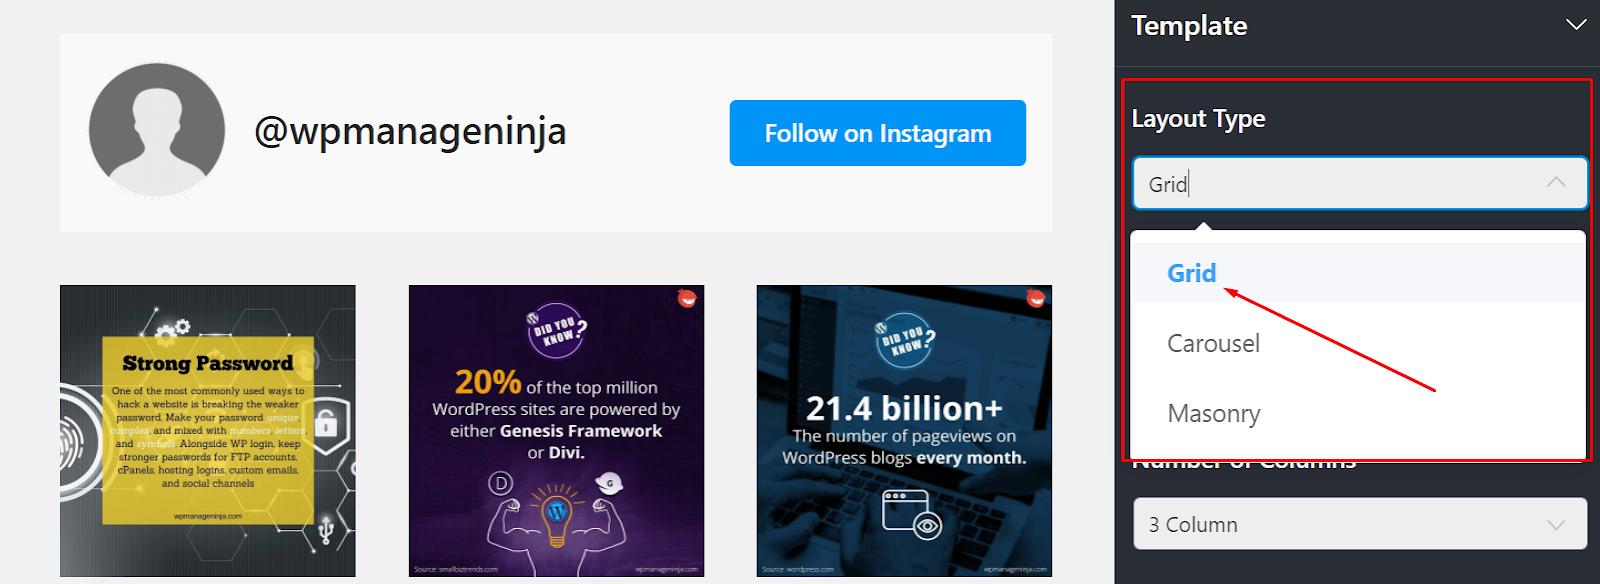 Instagram layout Layout type